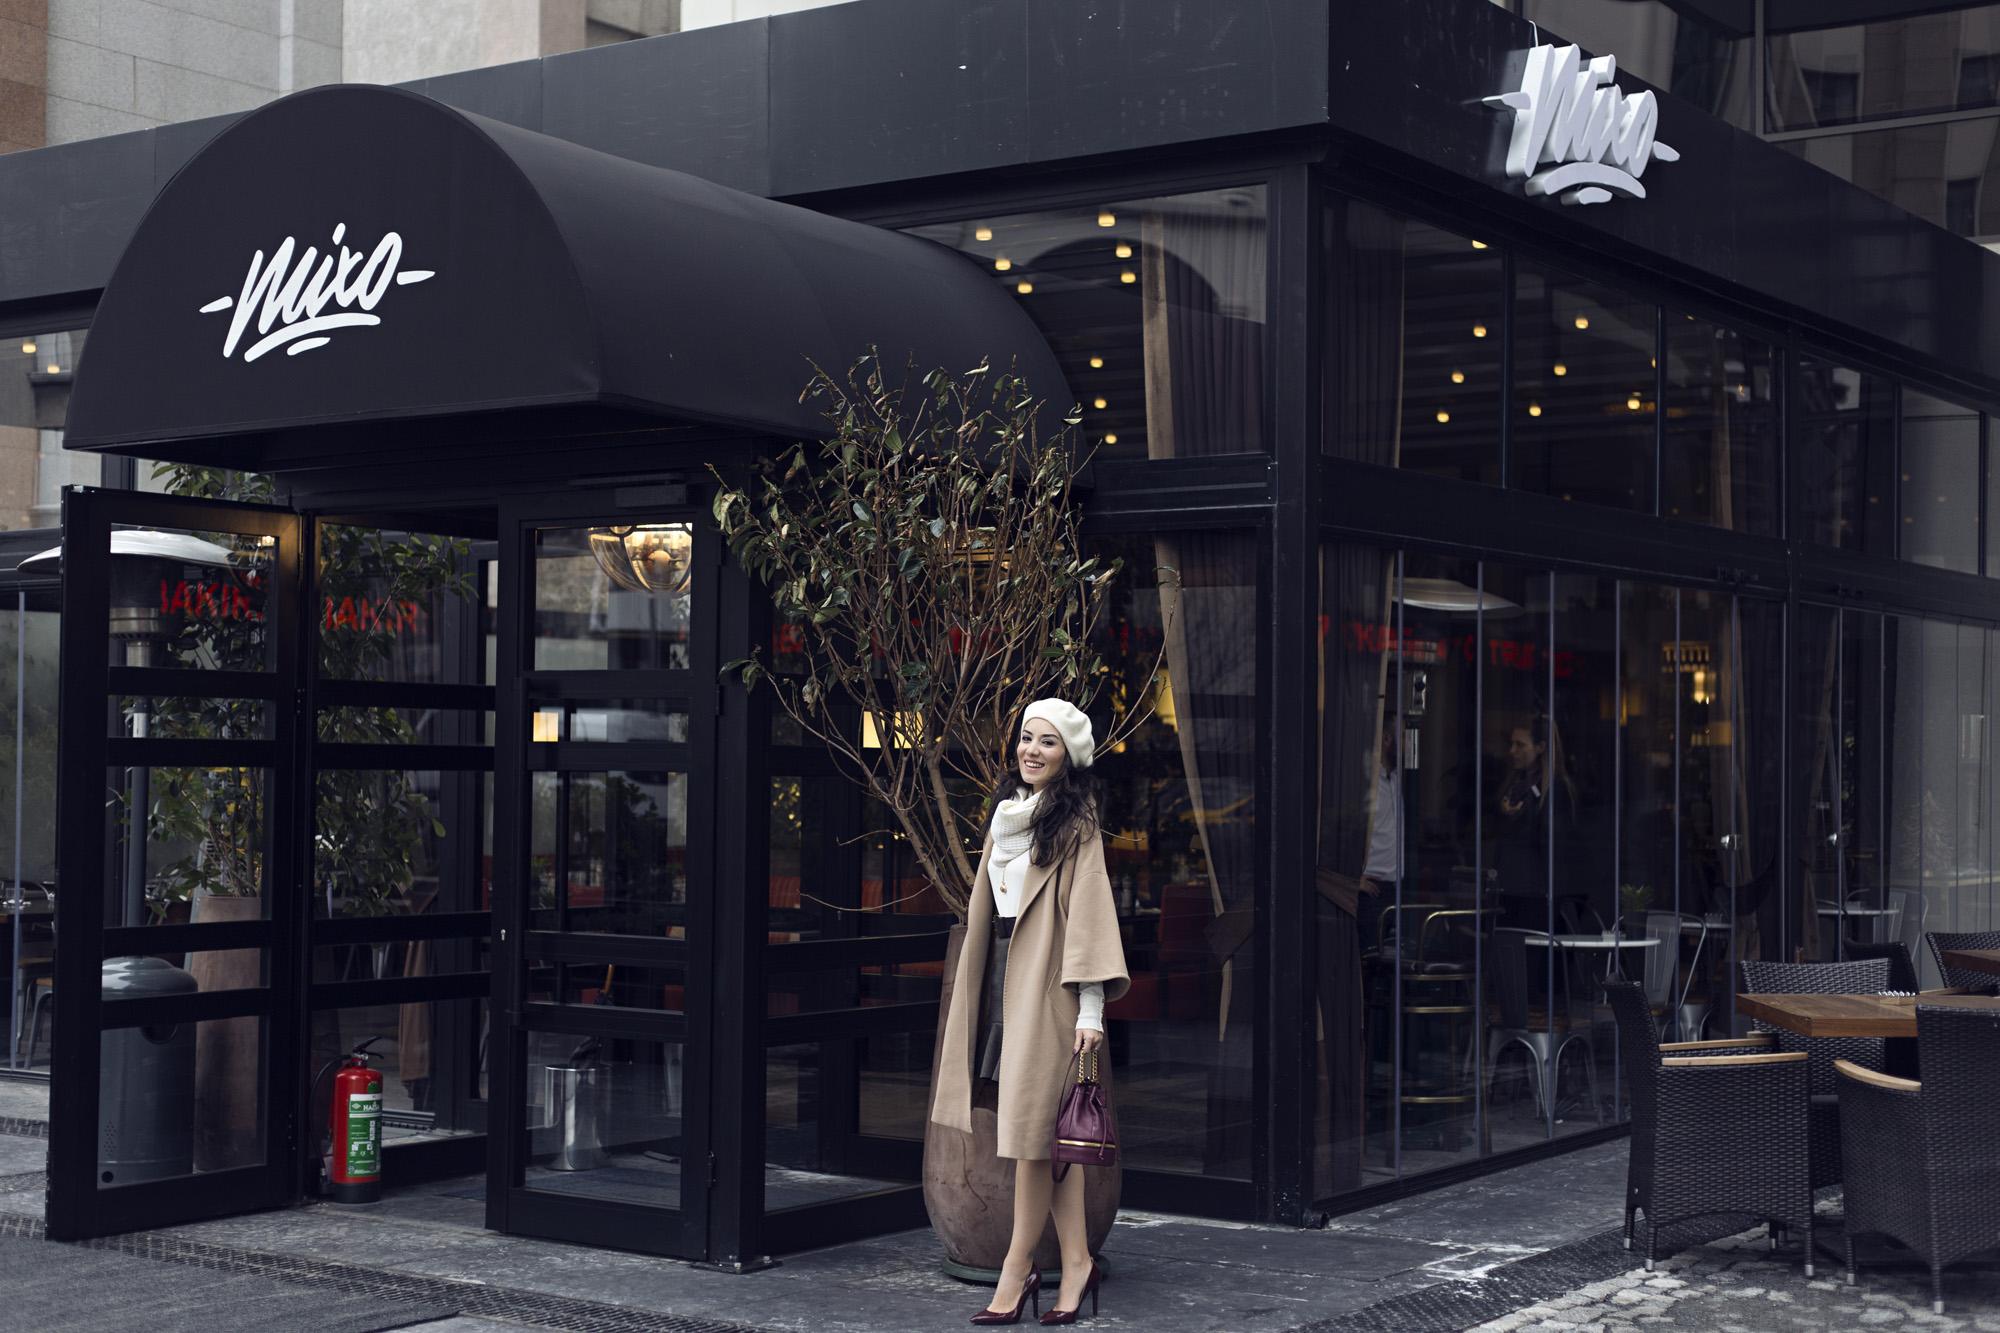 mixo restaurant